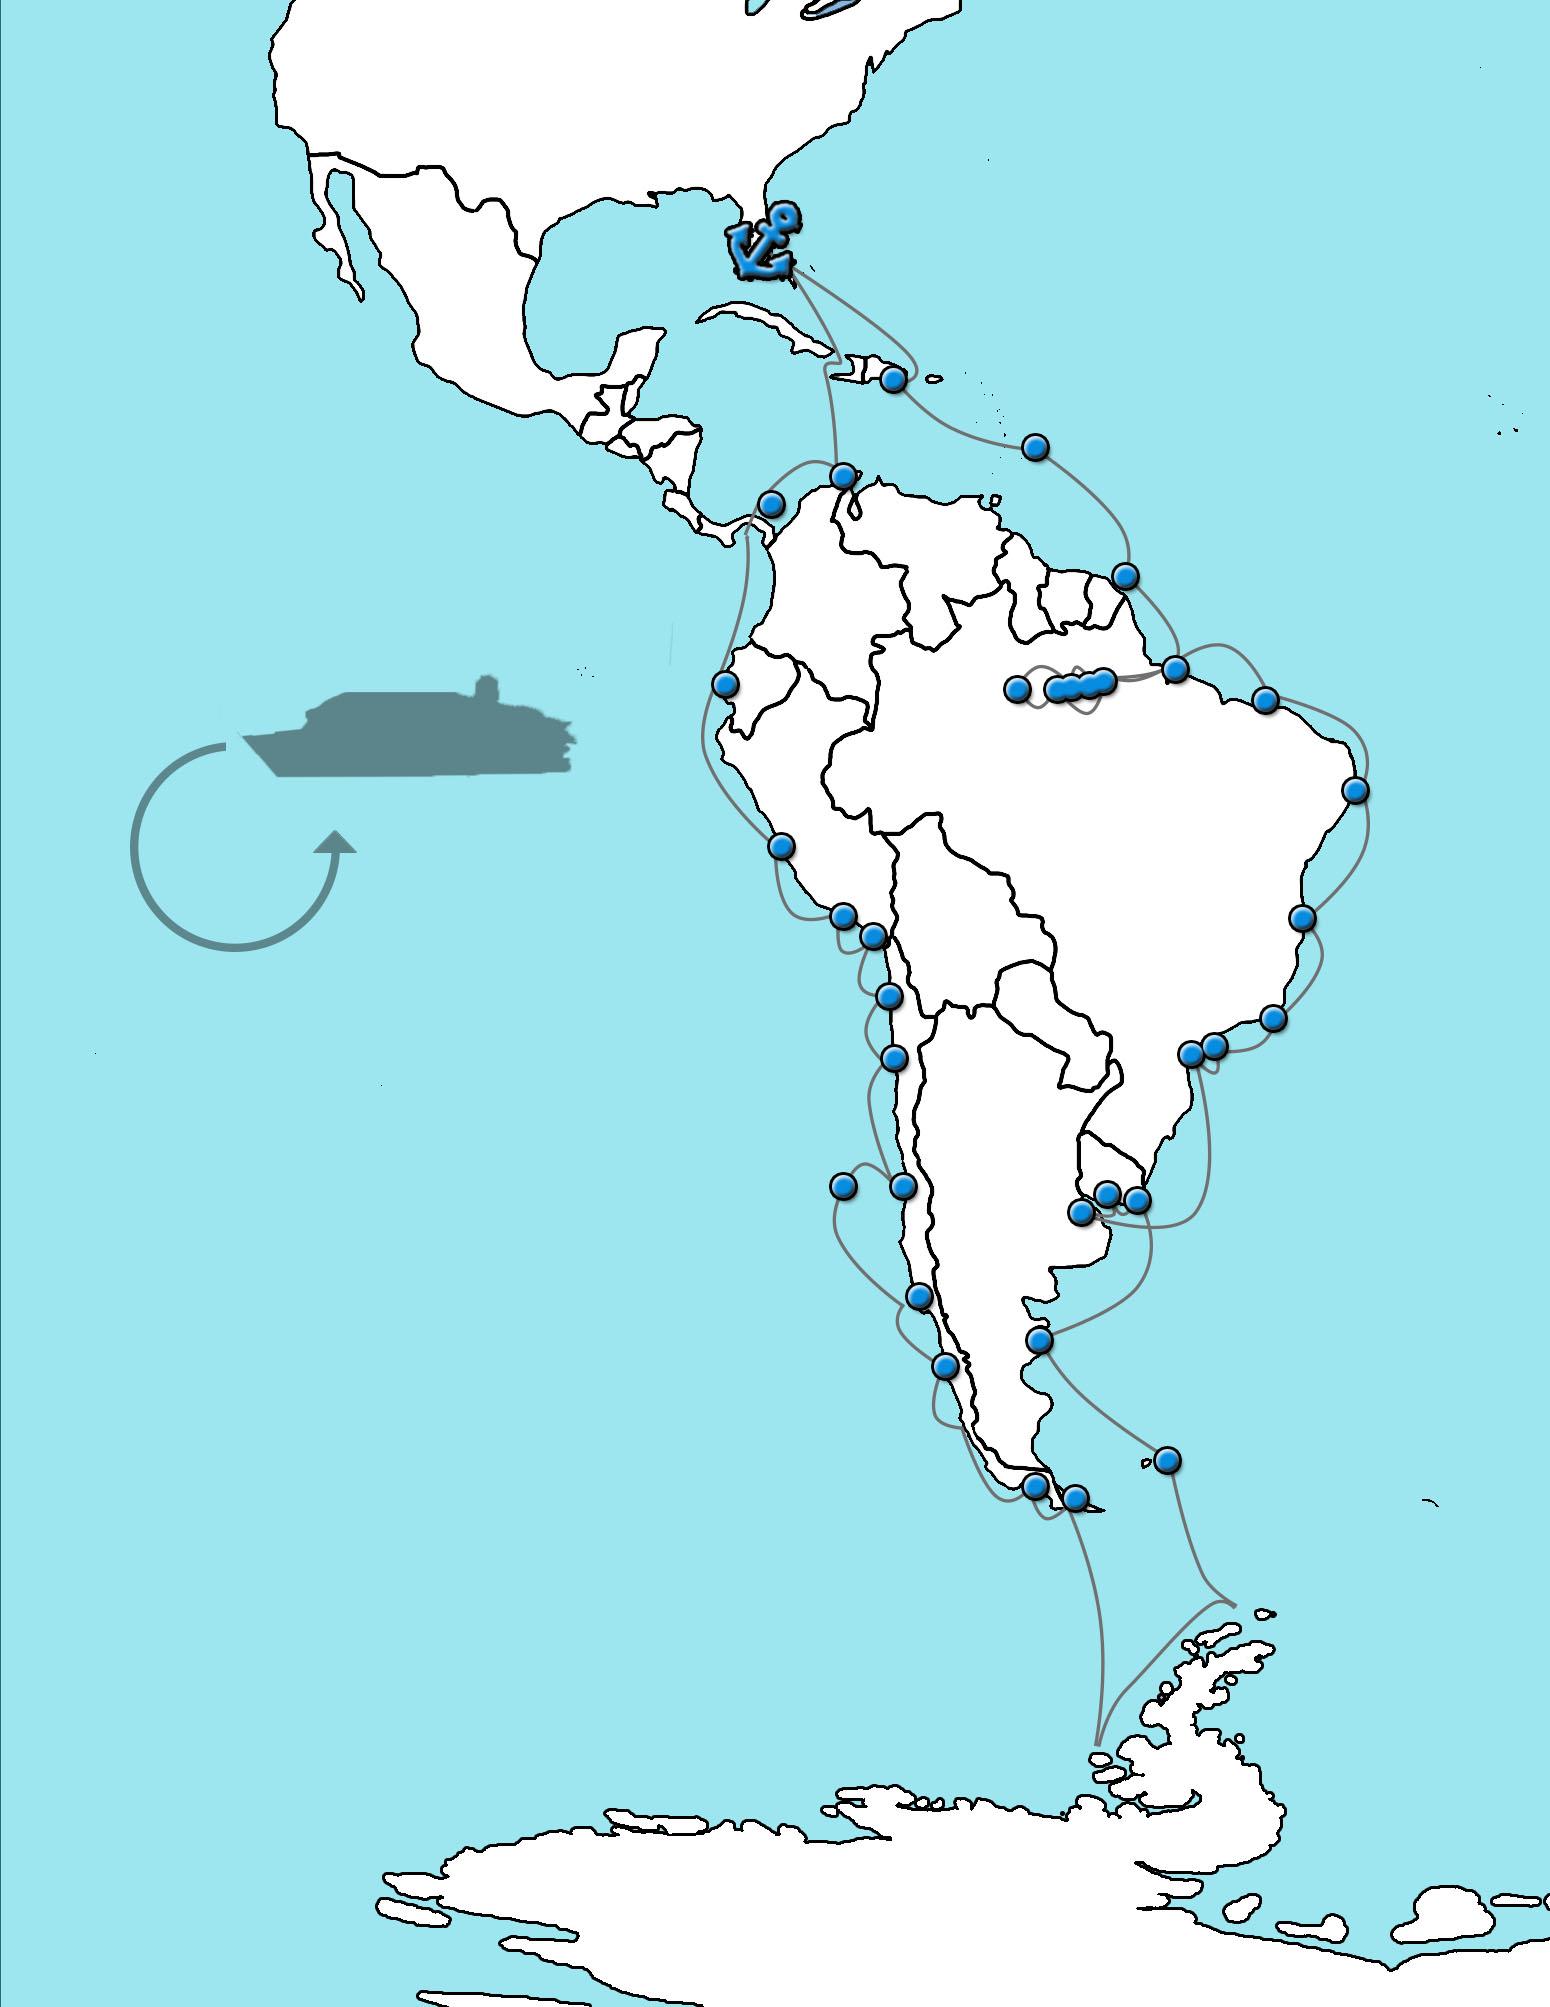 Grand voyage Zuid Amerika 2021 HAL